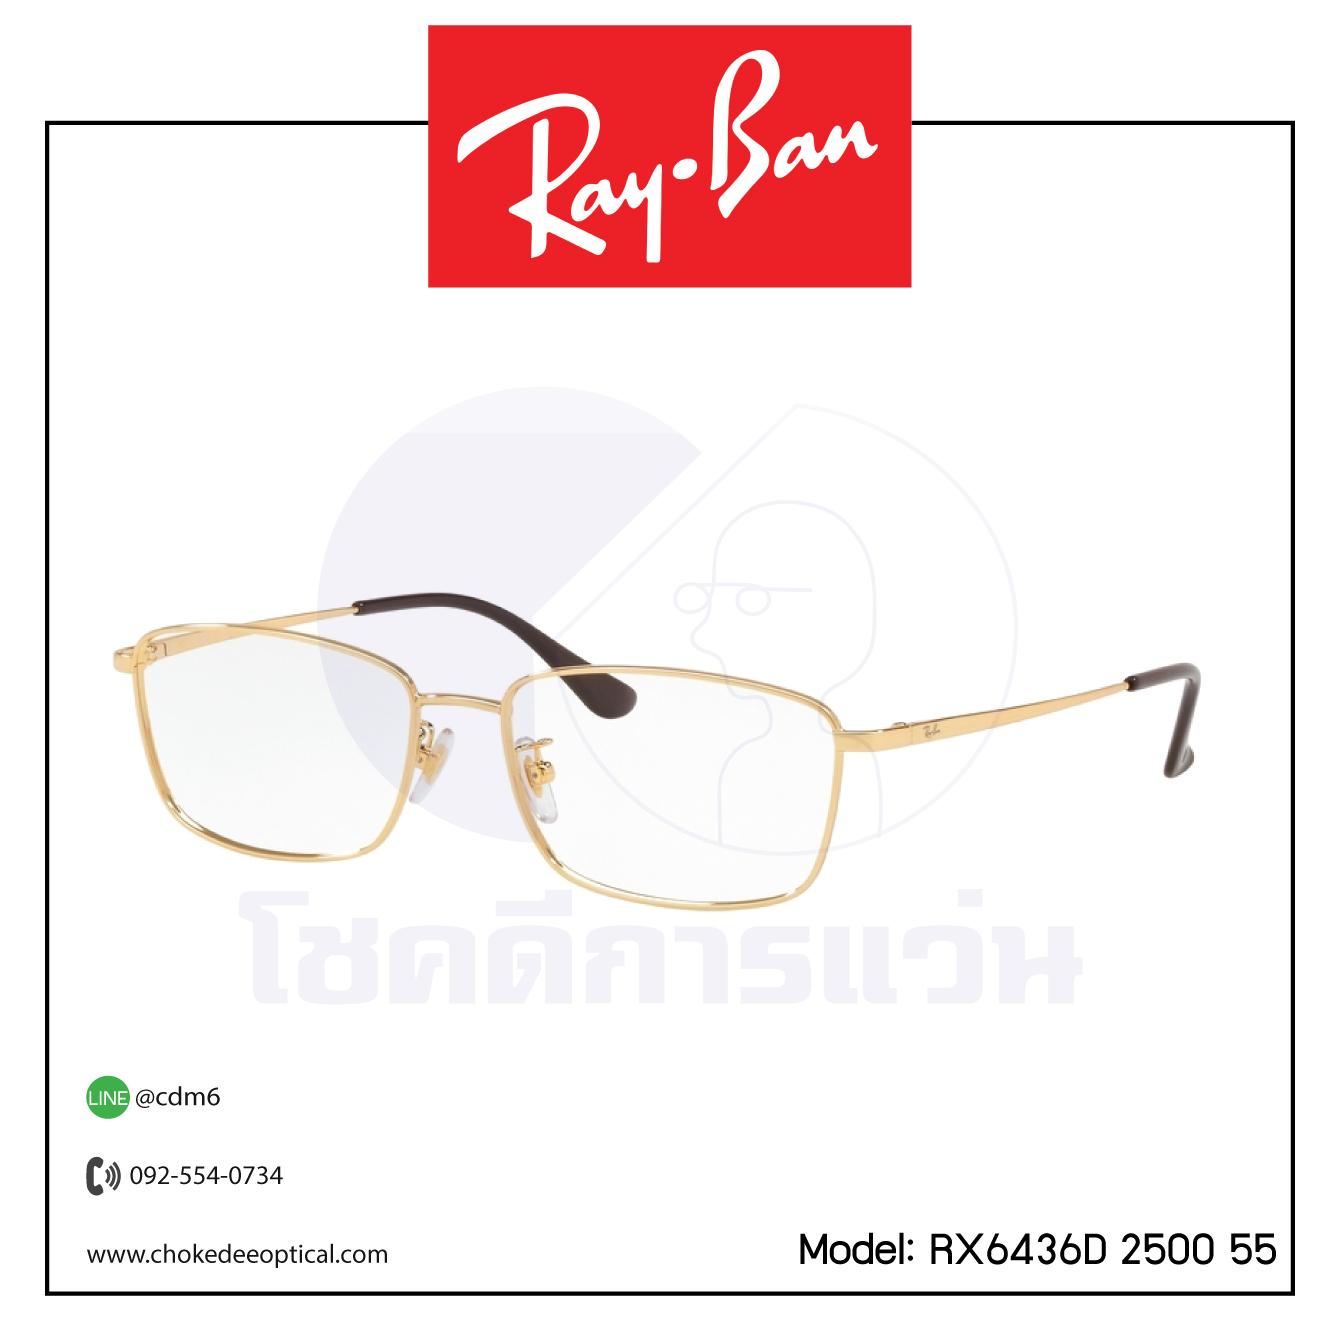 Rayban RX6436D 2500 55